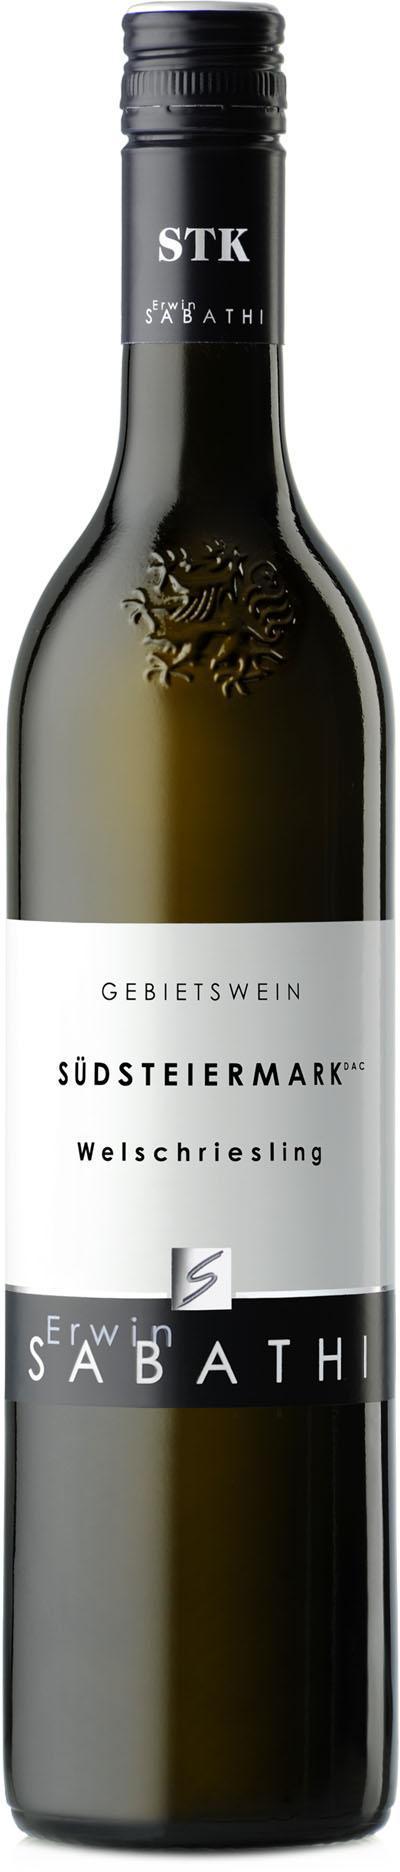 Welschriesling Südsteiermark DAC 2020 / Sabathi Erwin